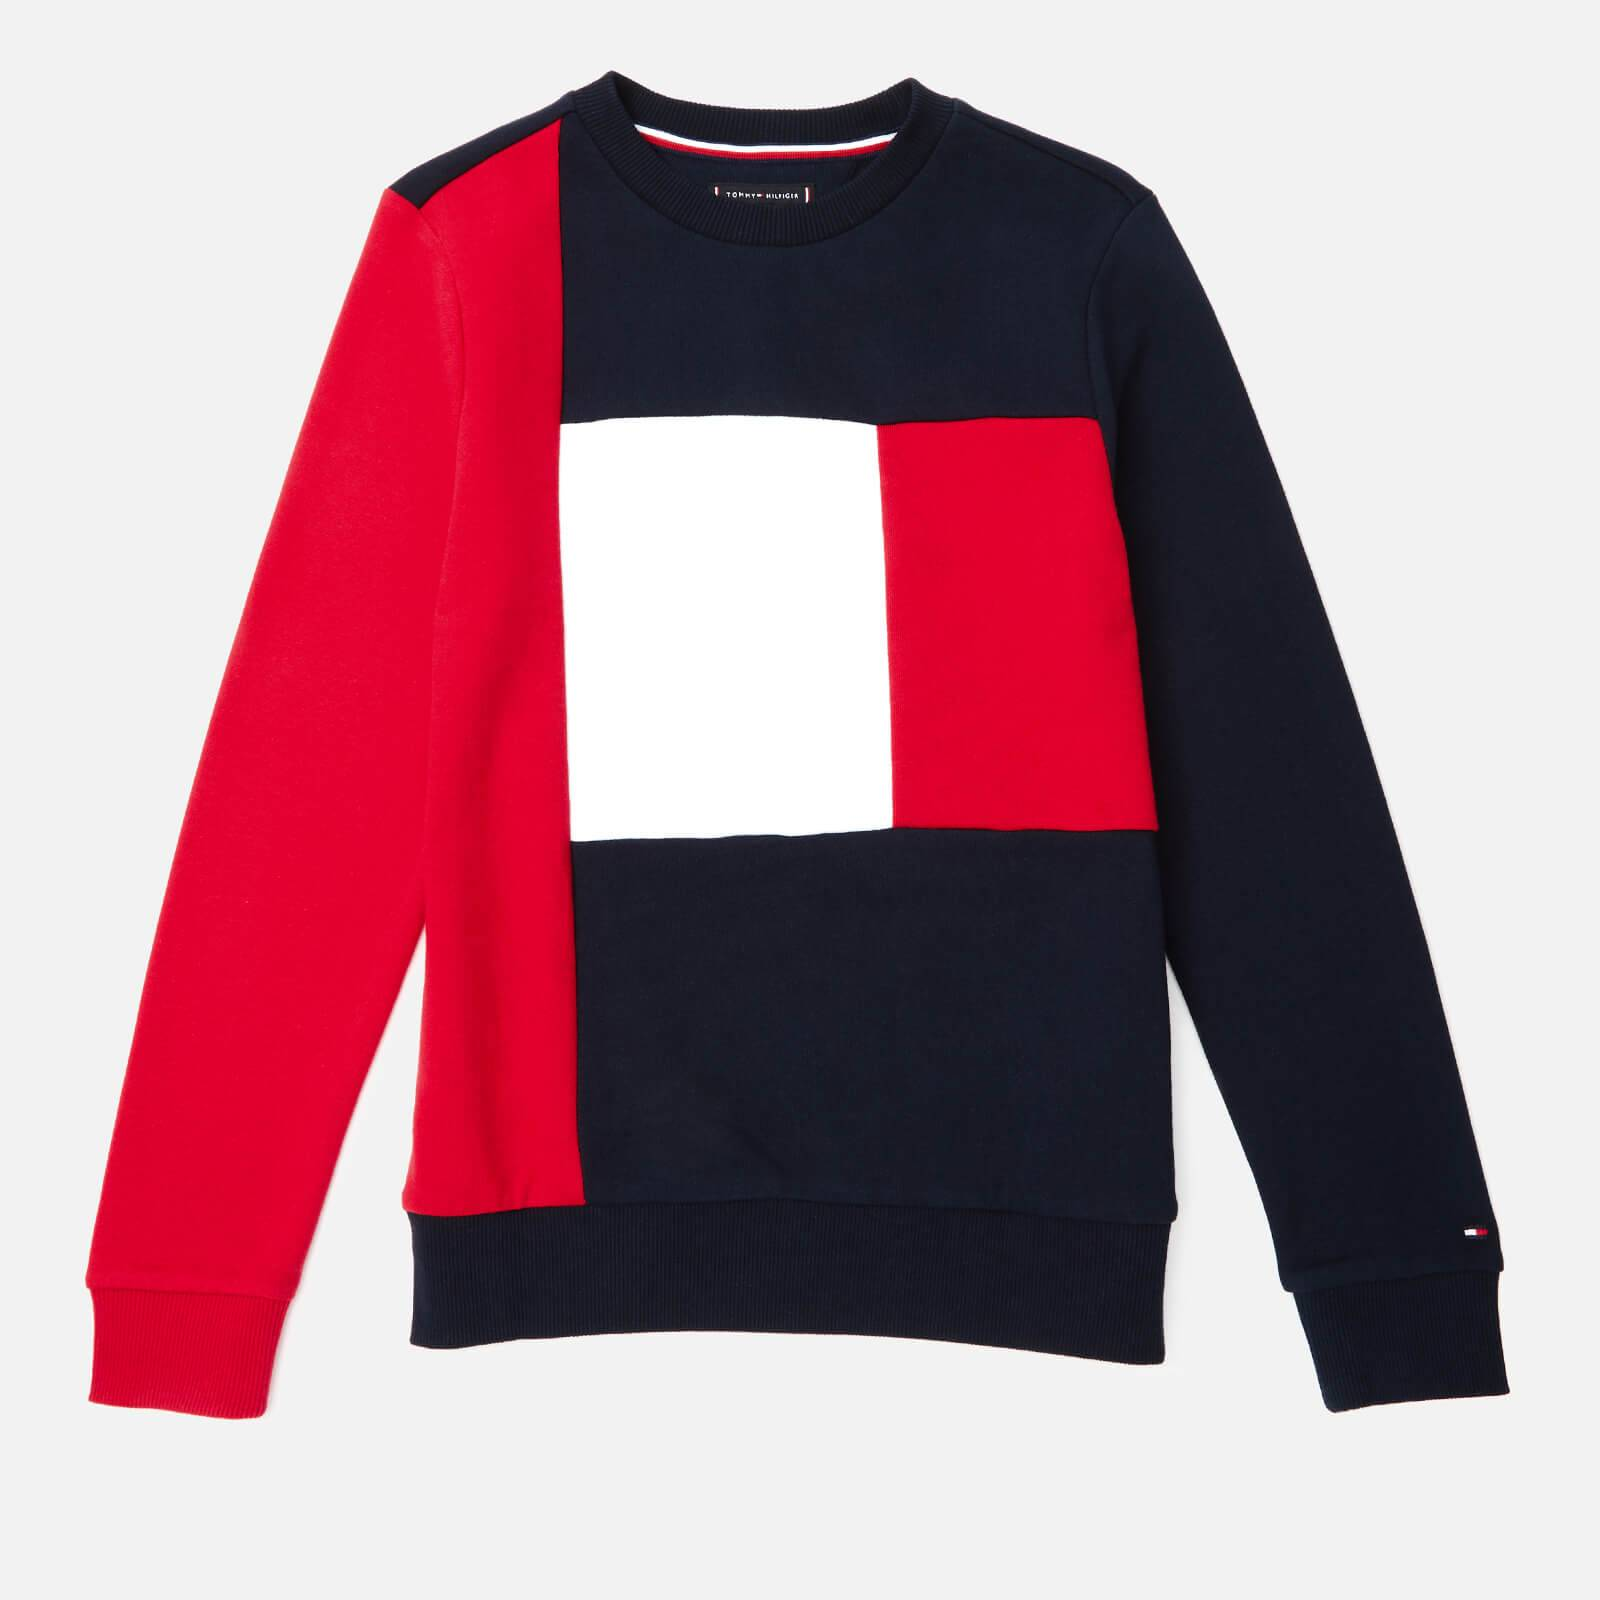 Tommy Hilfiger Boys' Colorblock Sweatshirt - Lychee - 6 Years - Multi